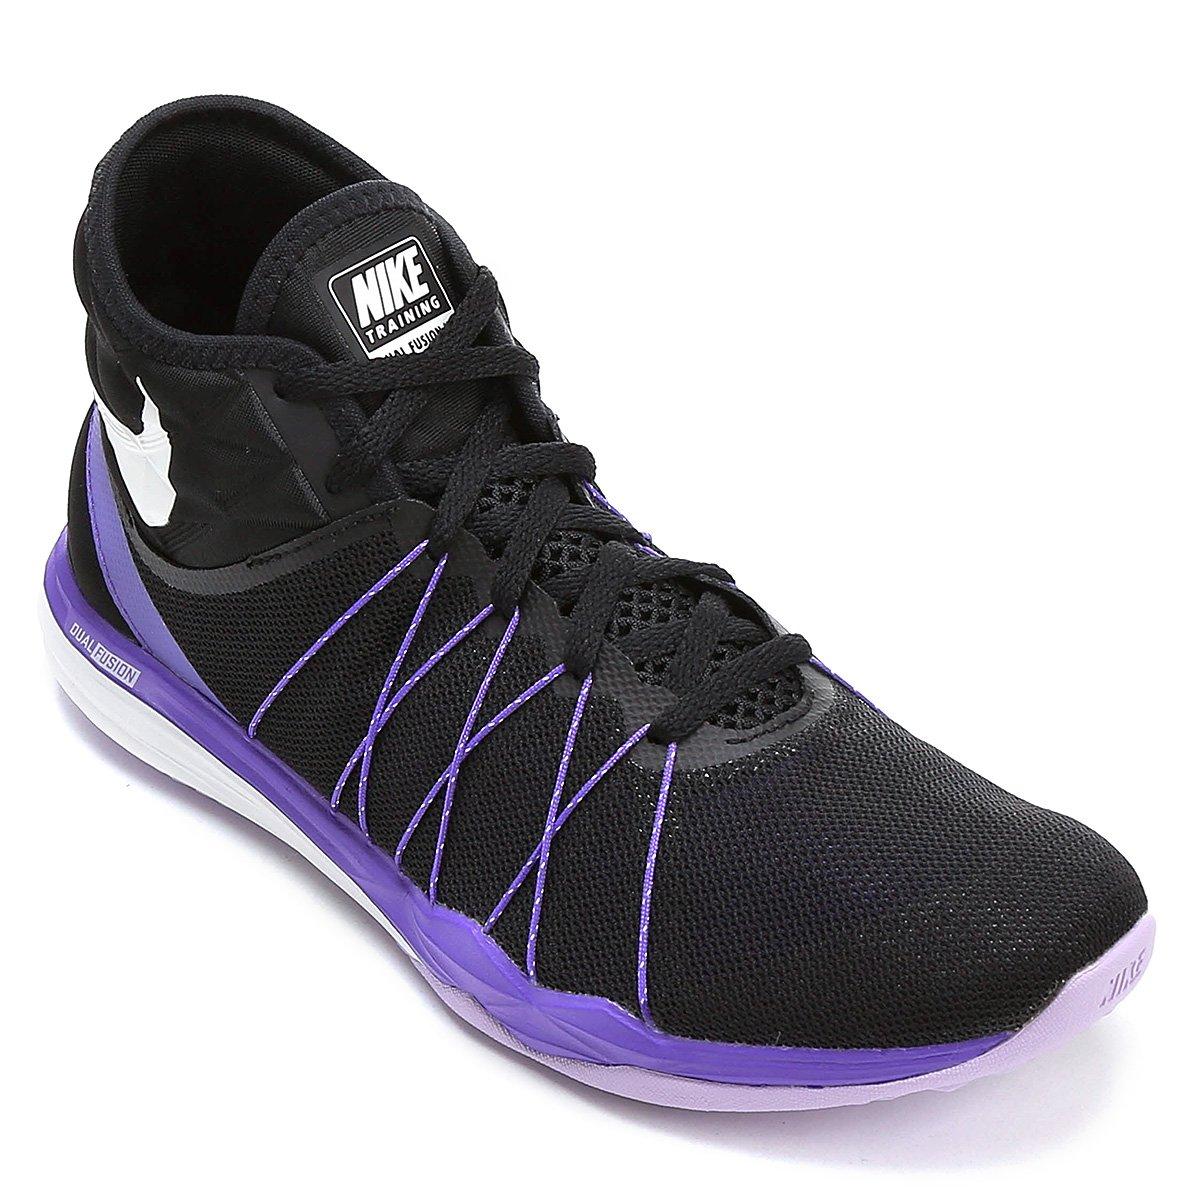 c420569d3d3 Tênis Nike Dual Fusion TR Hit Feminino - Compre Agora